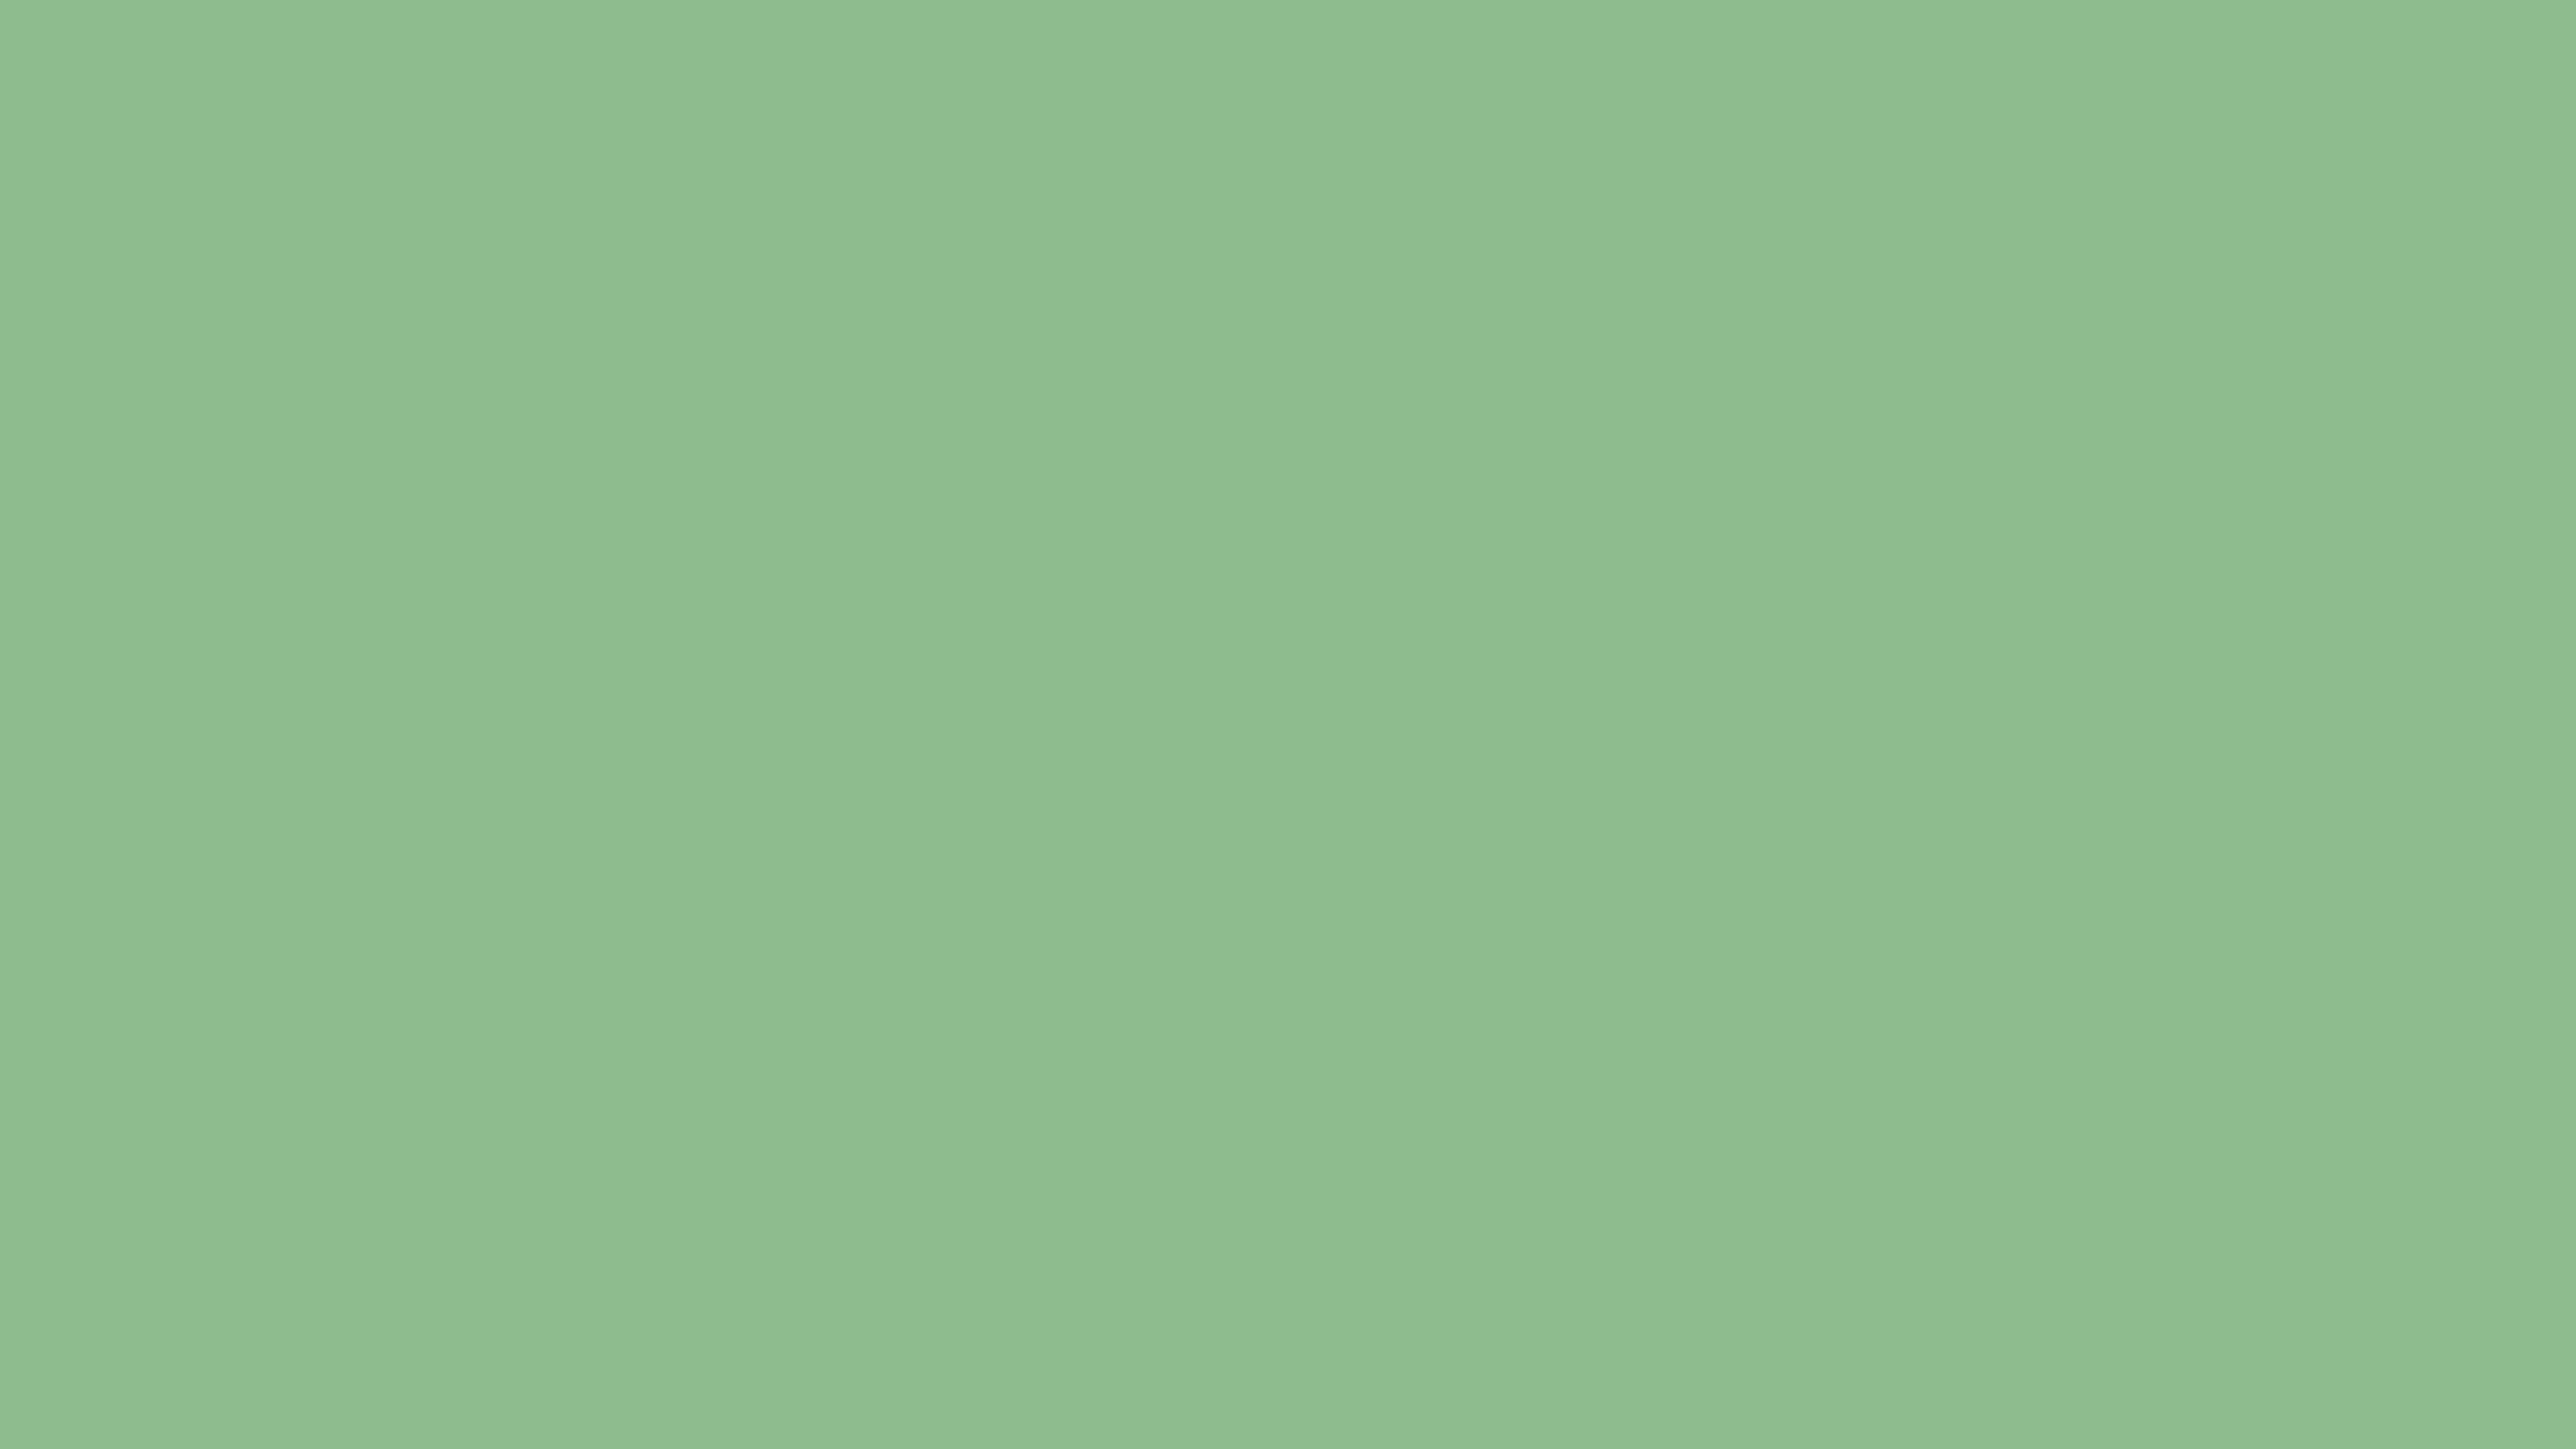 3840x2160 Dark Sea Green Solid Color Background